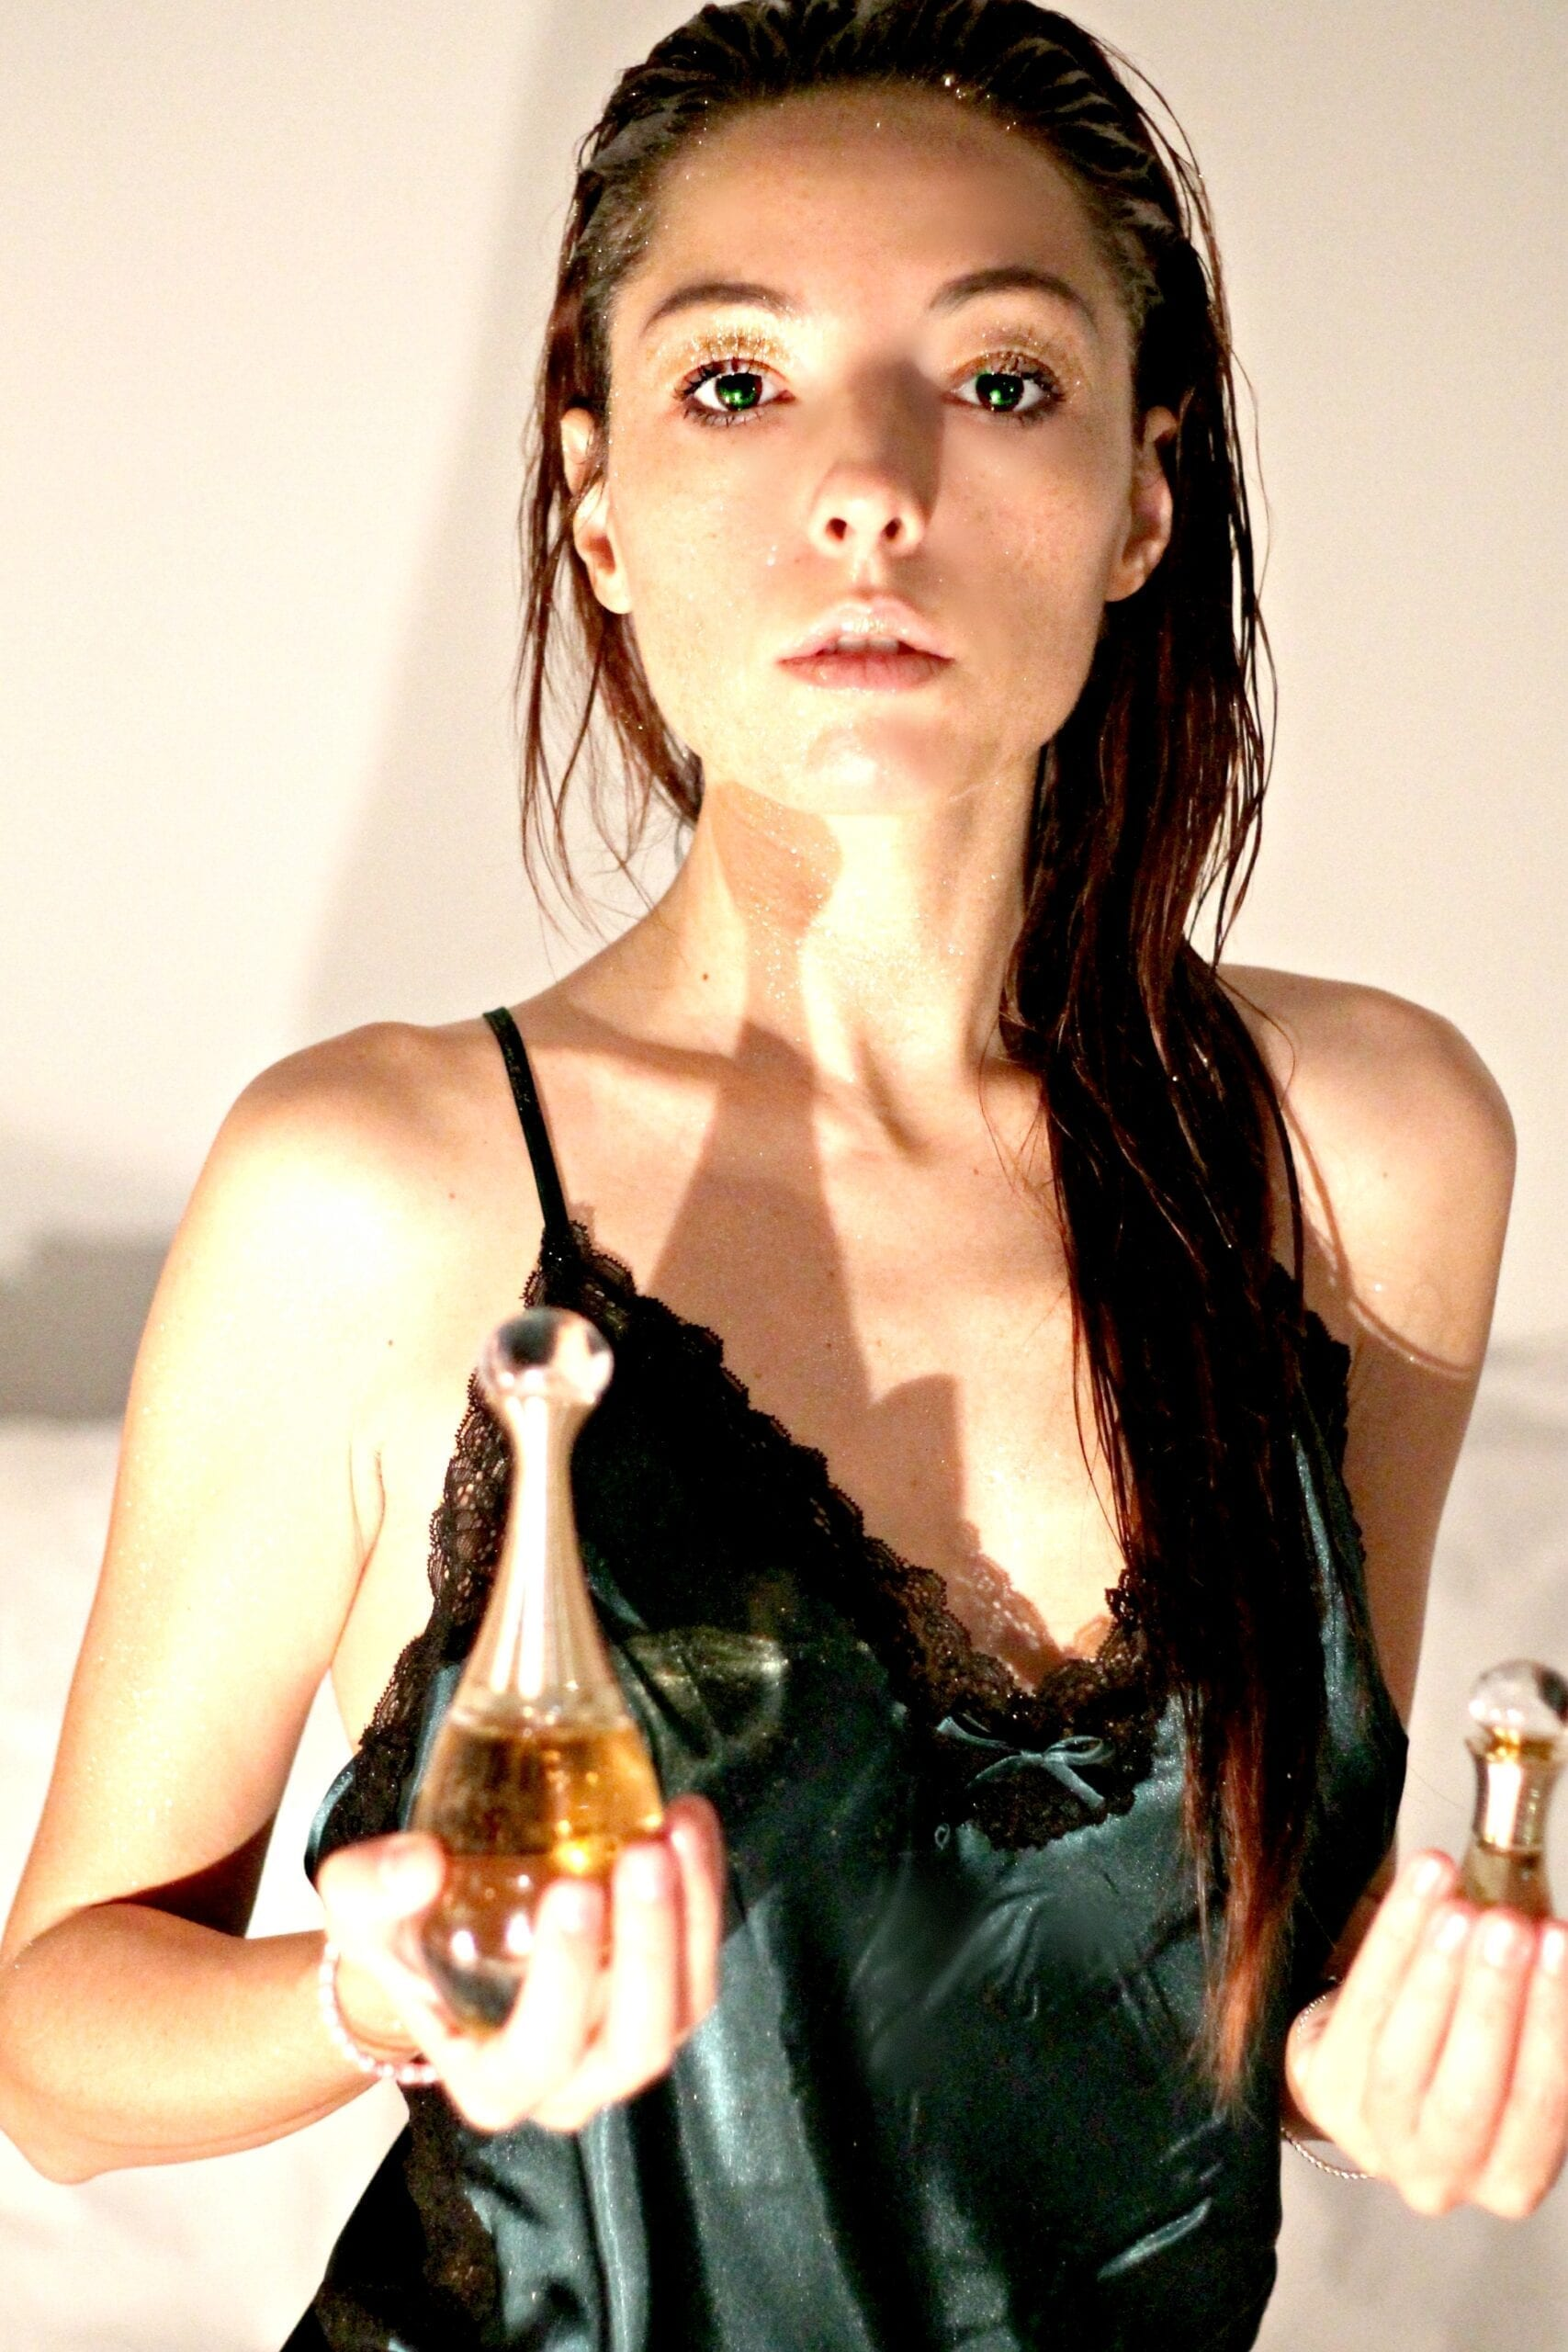 dior perfume touche de parfum, theladycracy.it, elisa bellino, profumi donna più buonii